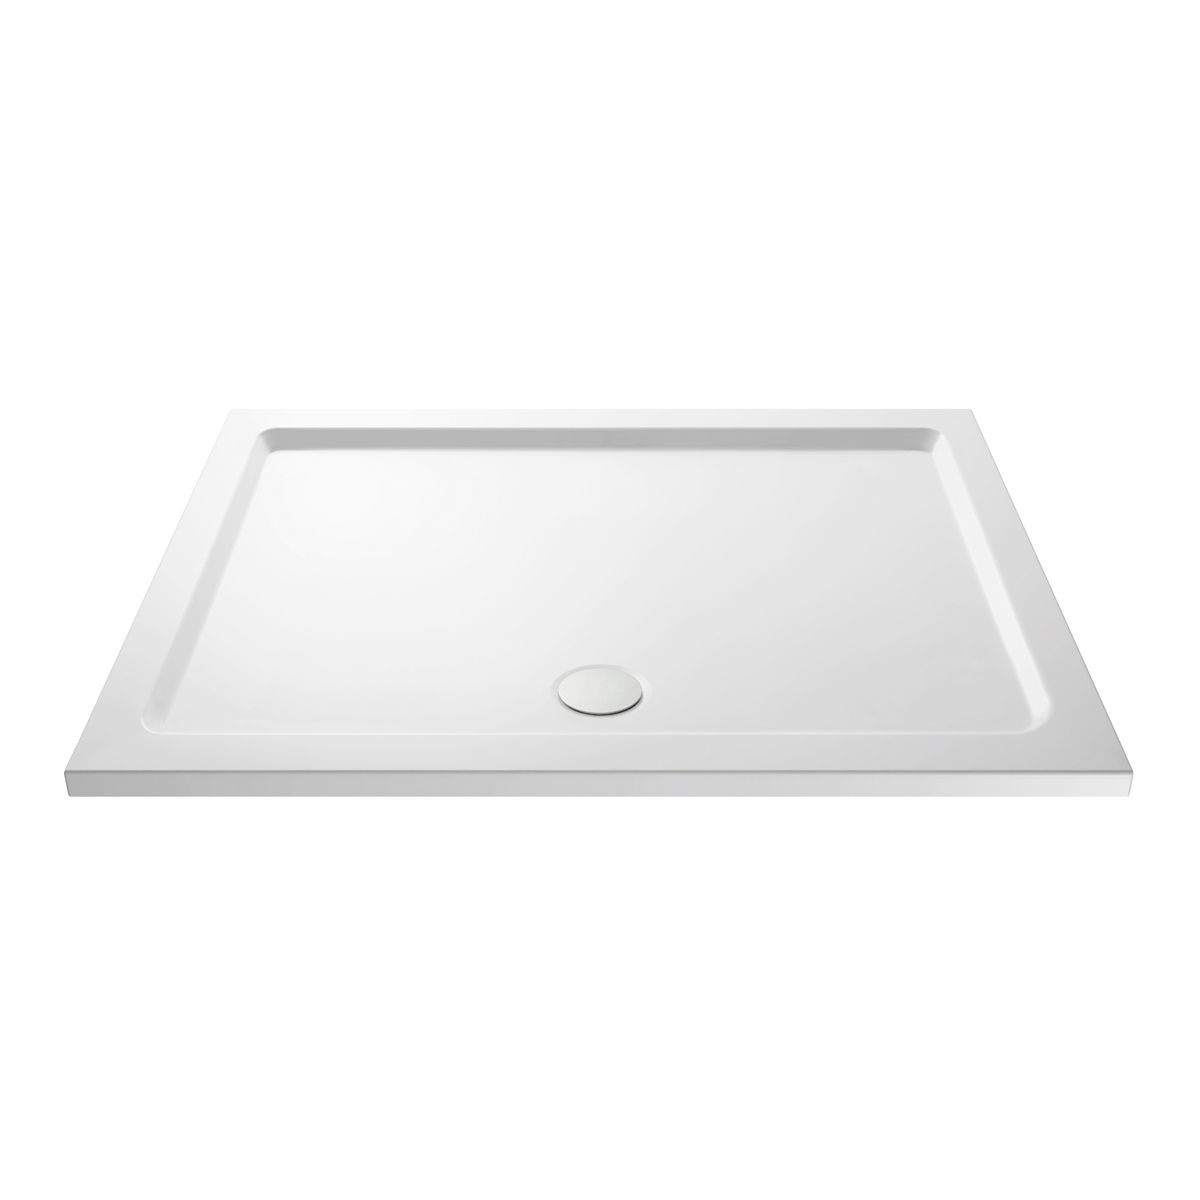 Cassellie Rectangular Shower Tray 1700 x 800mm